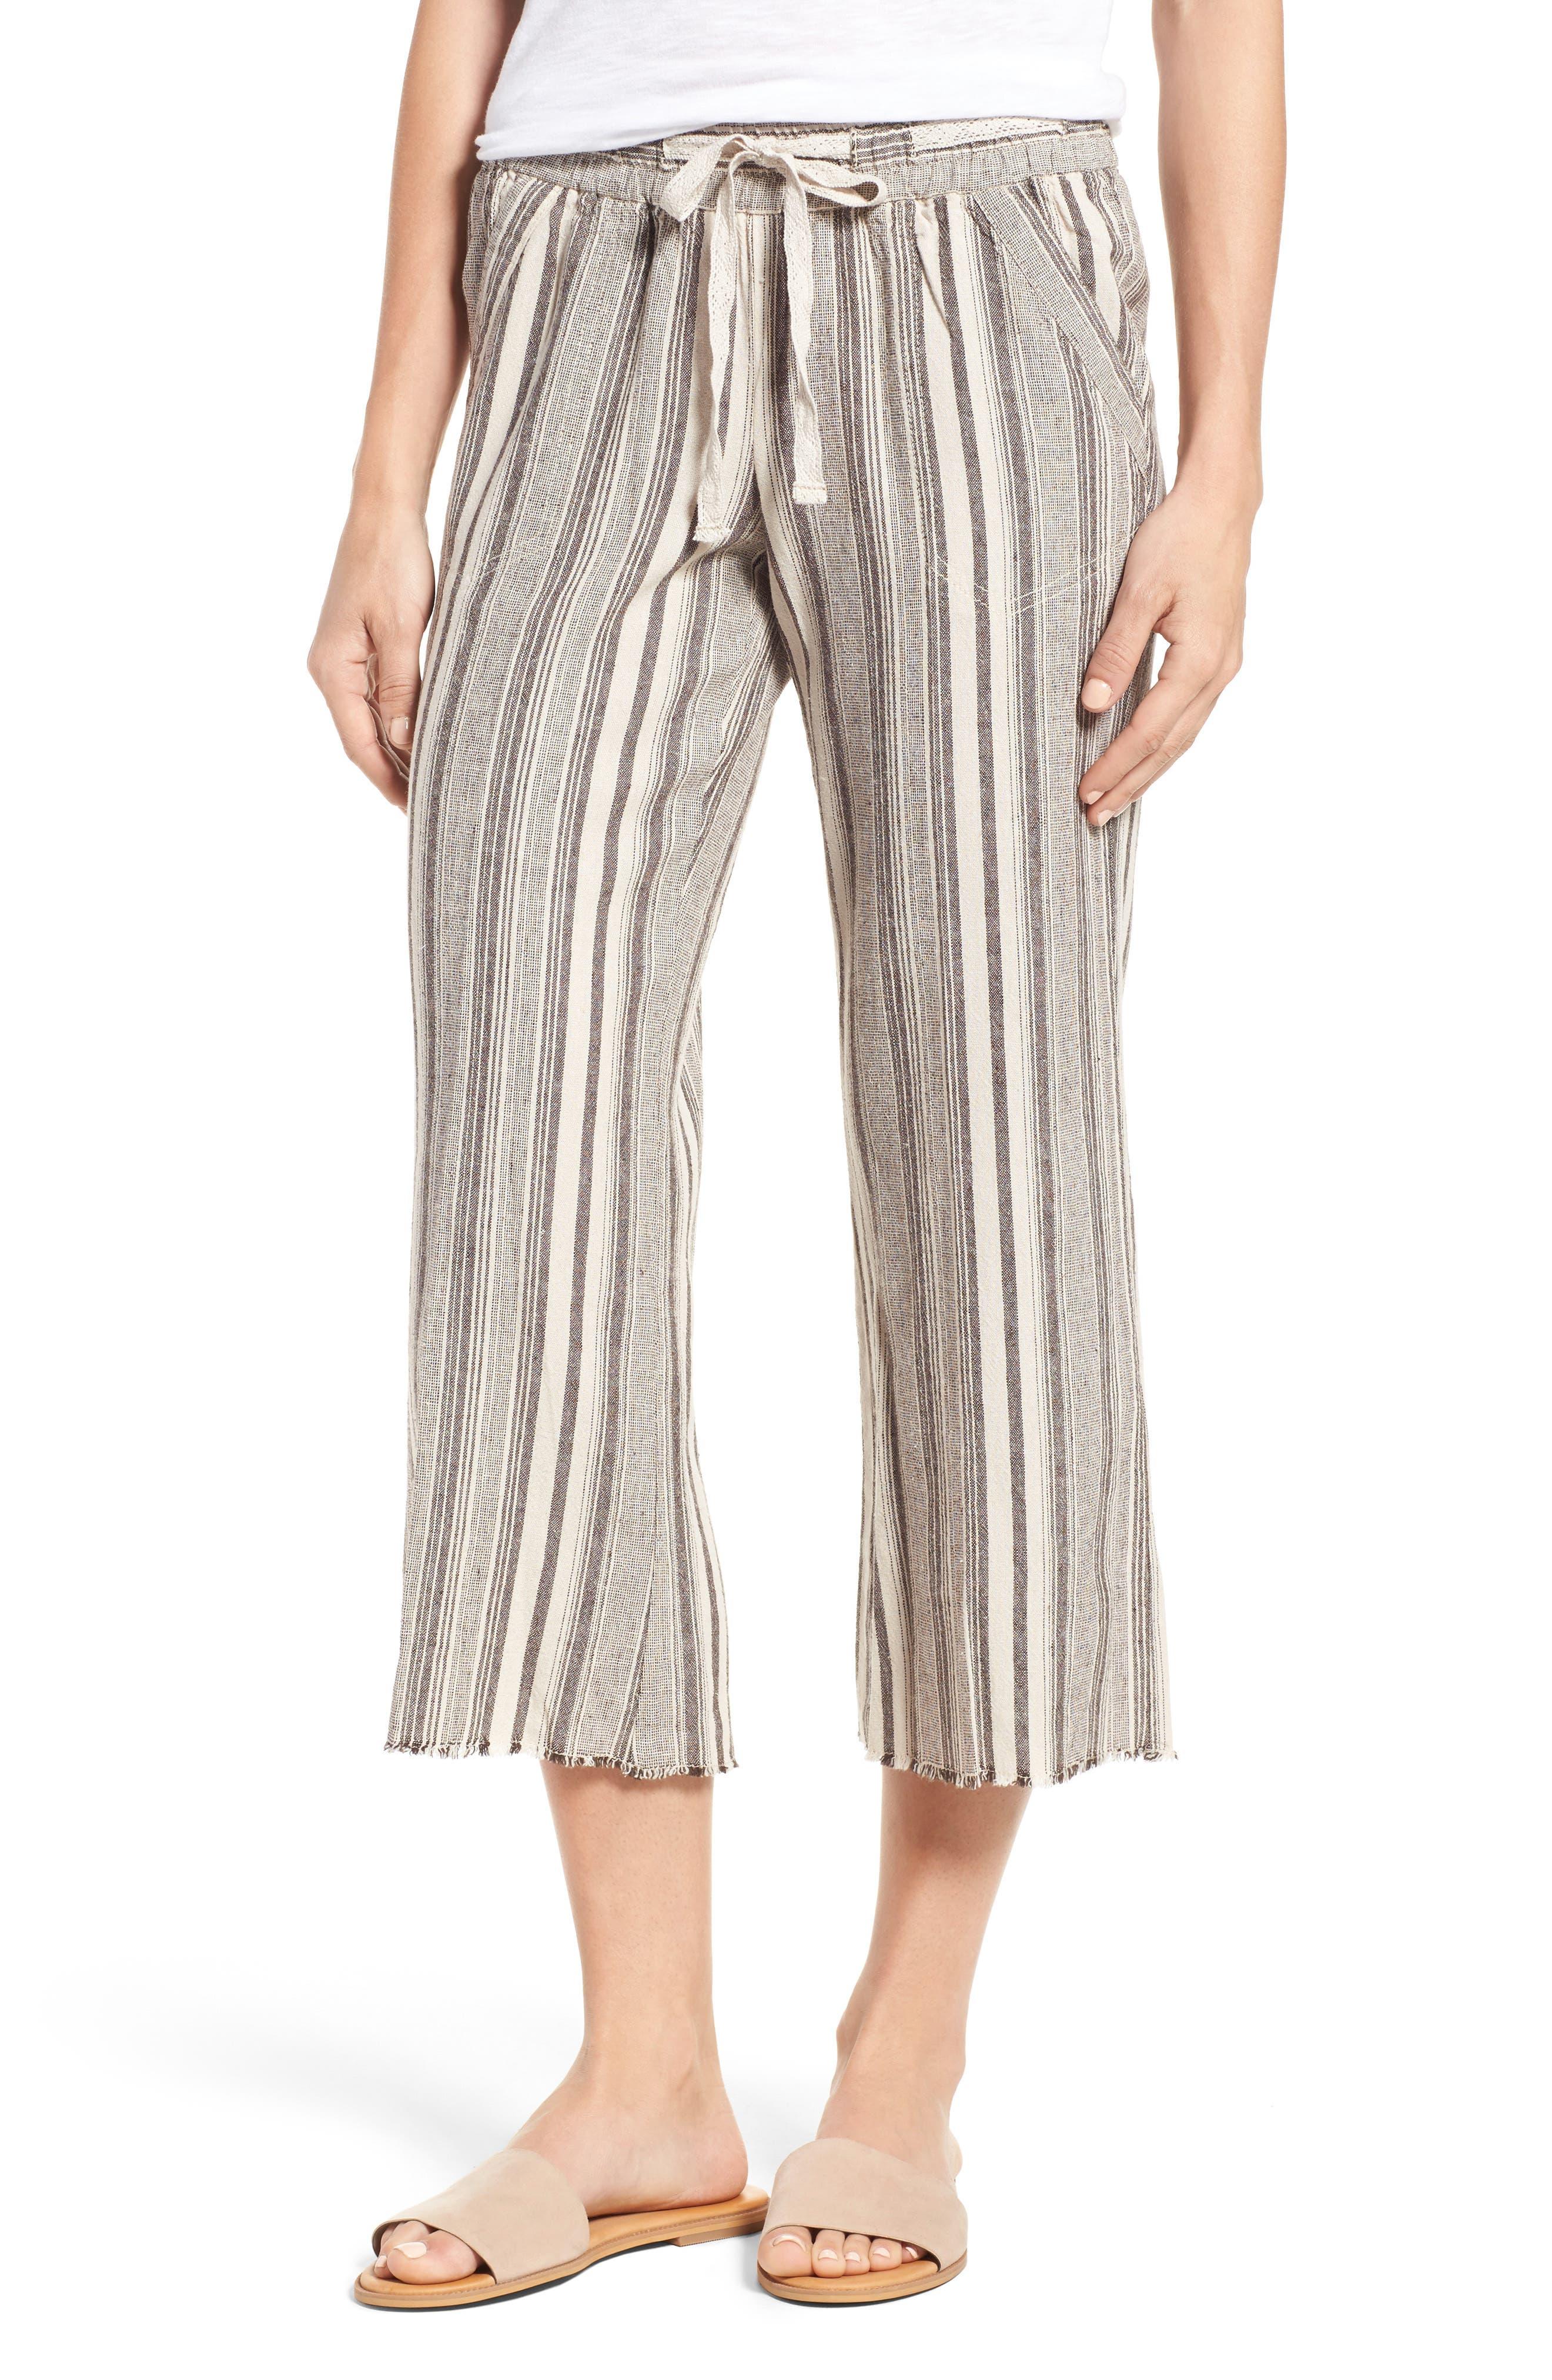 Alternate Image 1 Selected - Wit & Wisdom Drawstring Stripe Crop Sailor Pants (Nordstrom Exclusive) (Regular & Petite)